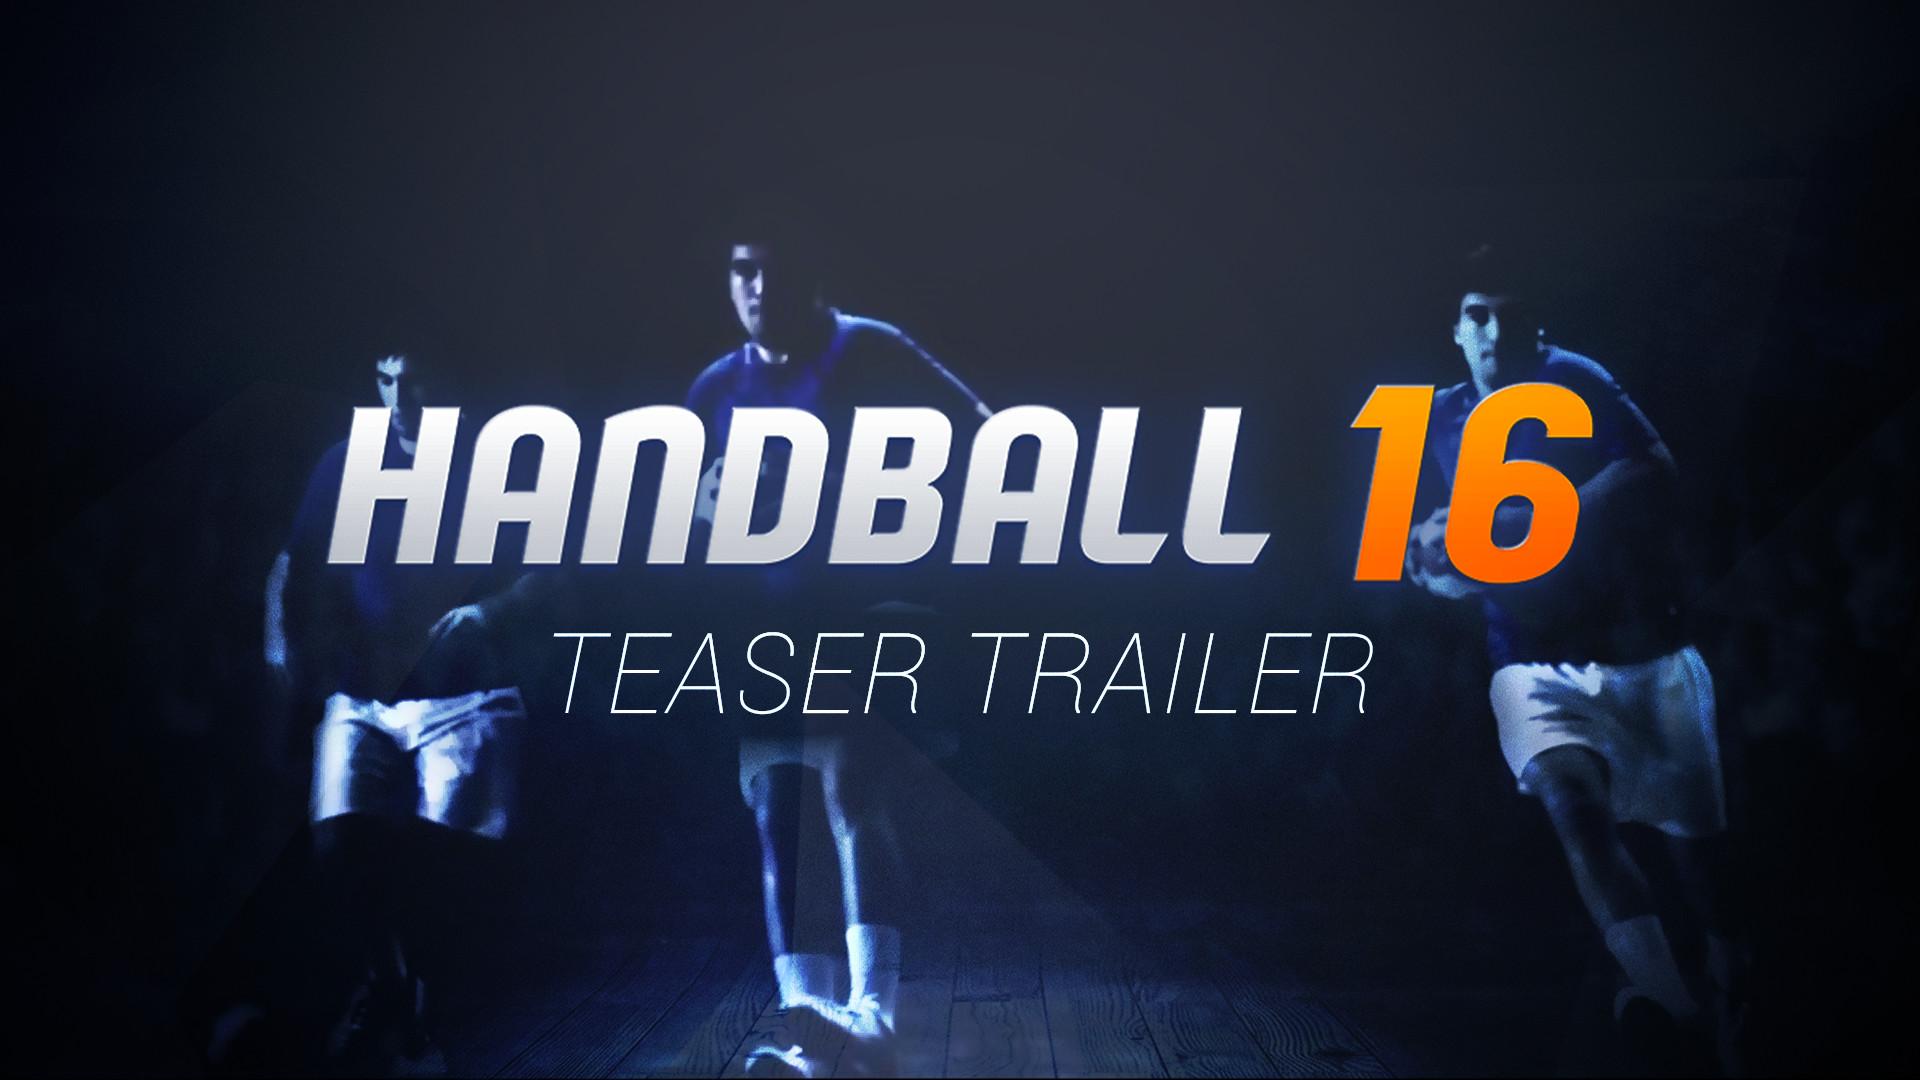 video-cover_handball16-teasertrailer.jpg